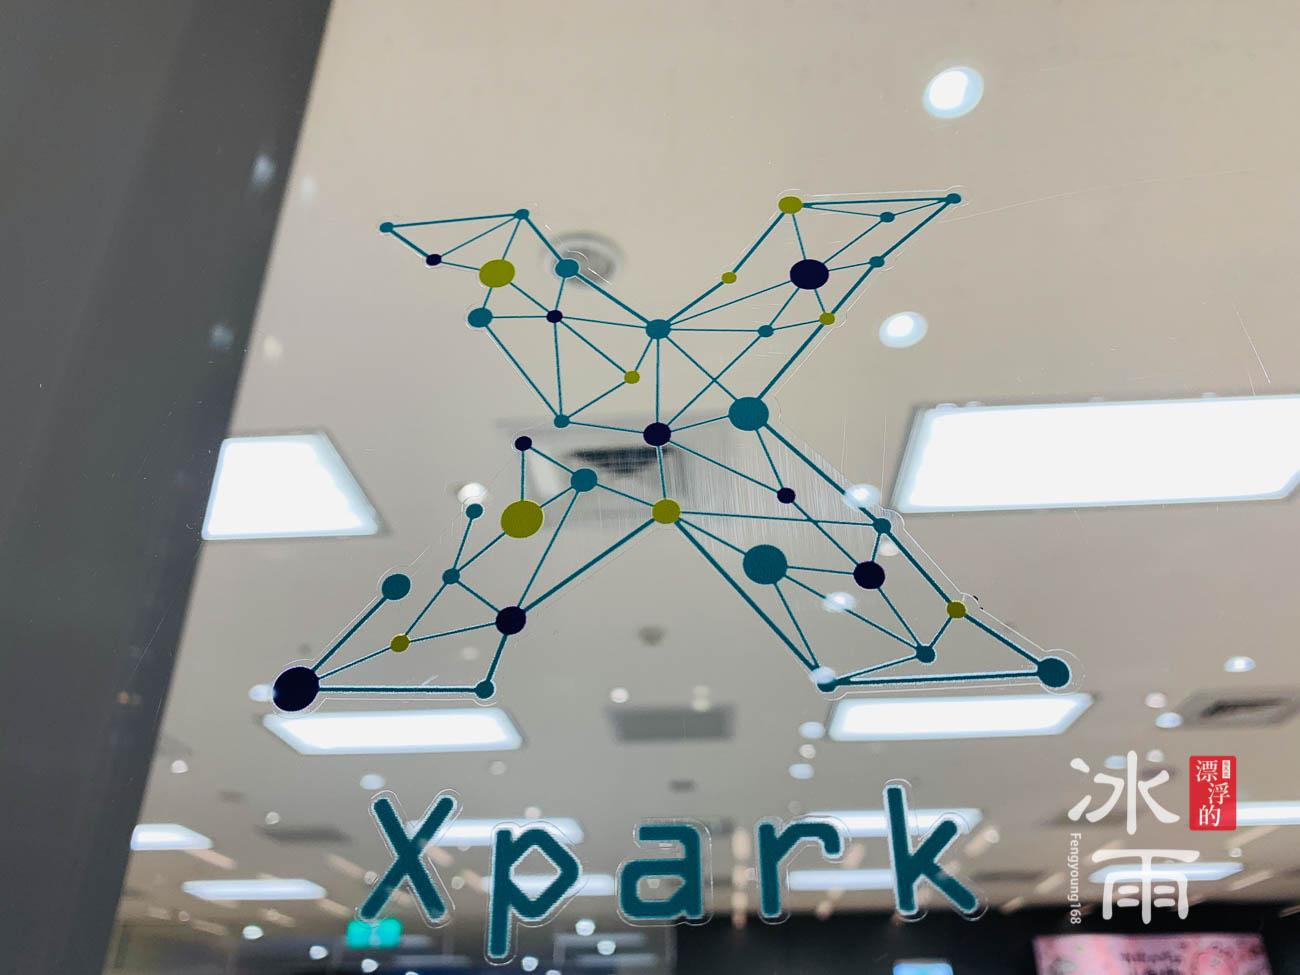 X fun Xpark水族館LOGO設計,在禮品店玻璃上的貼紙